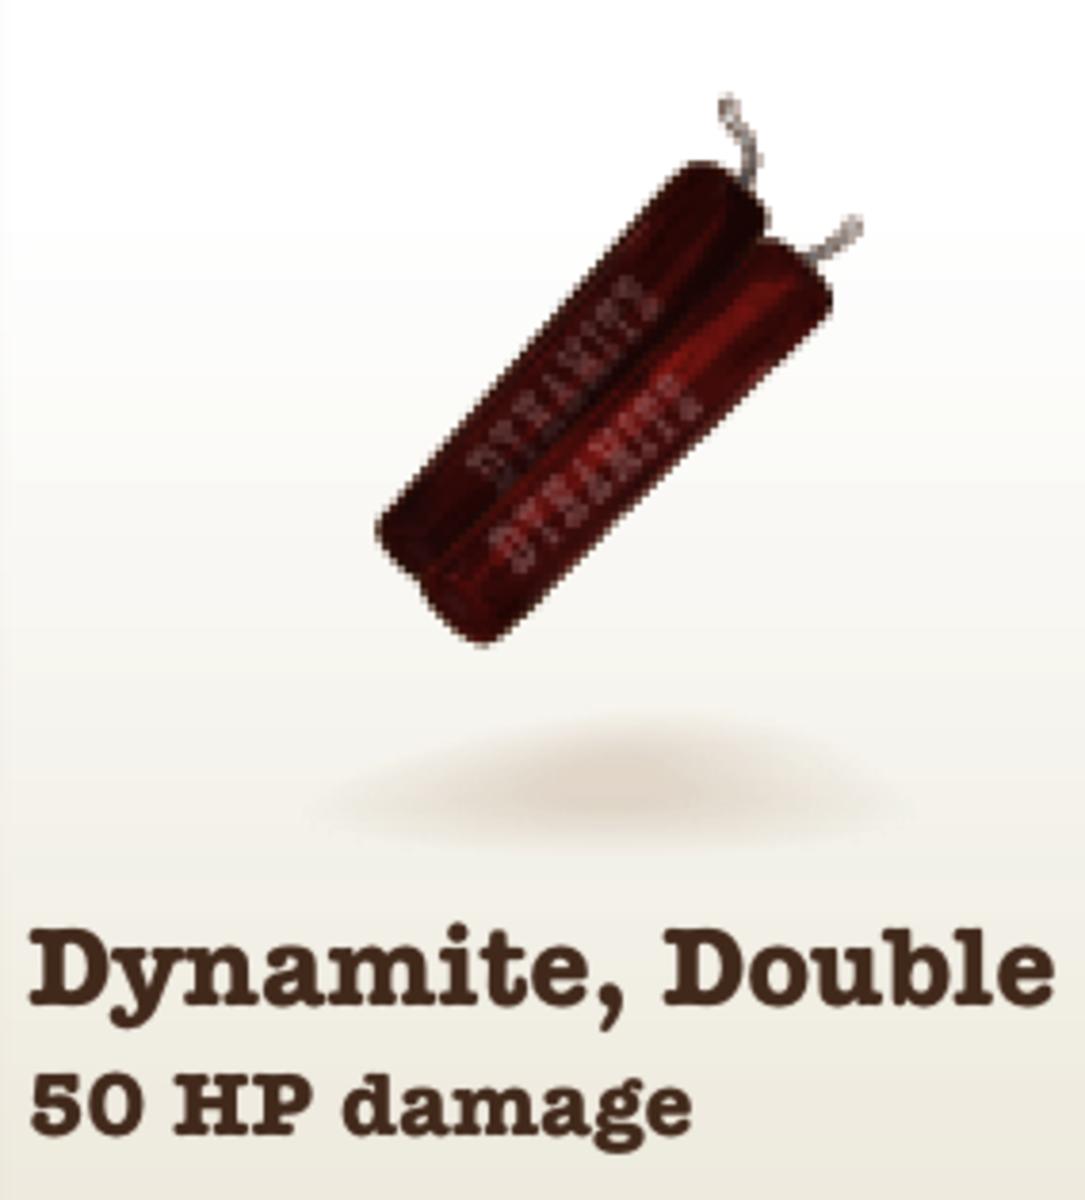 Dynamite Double!